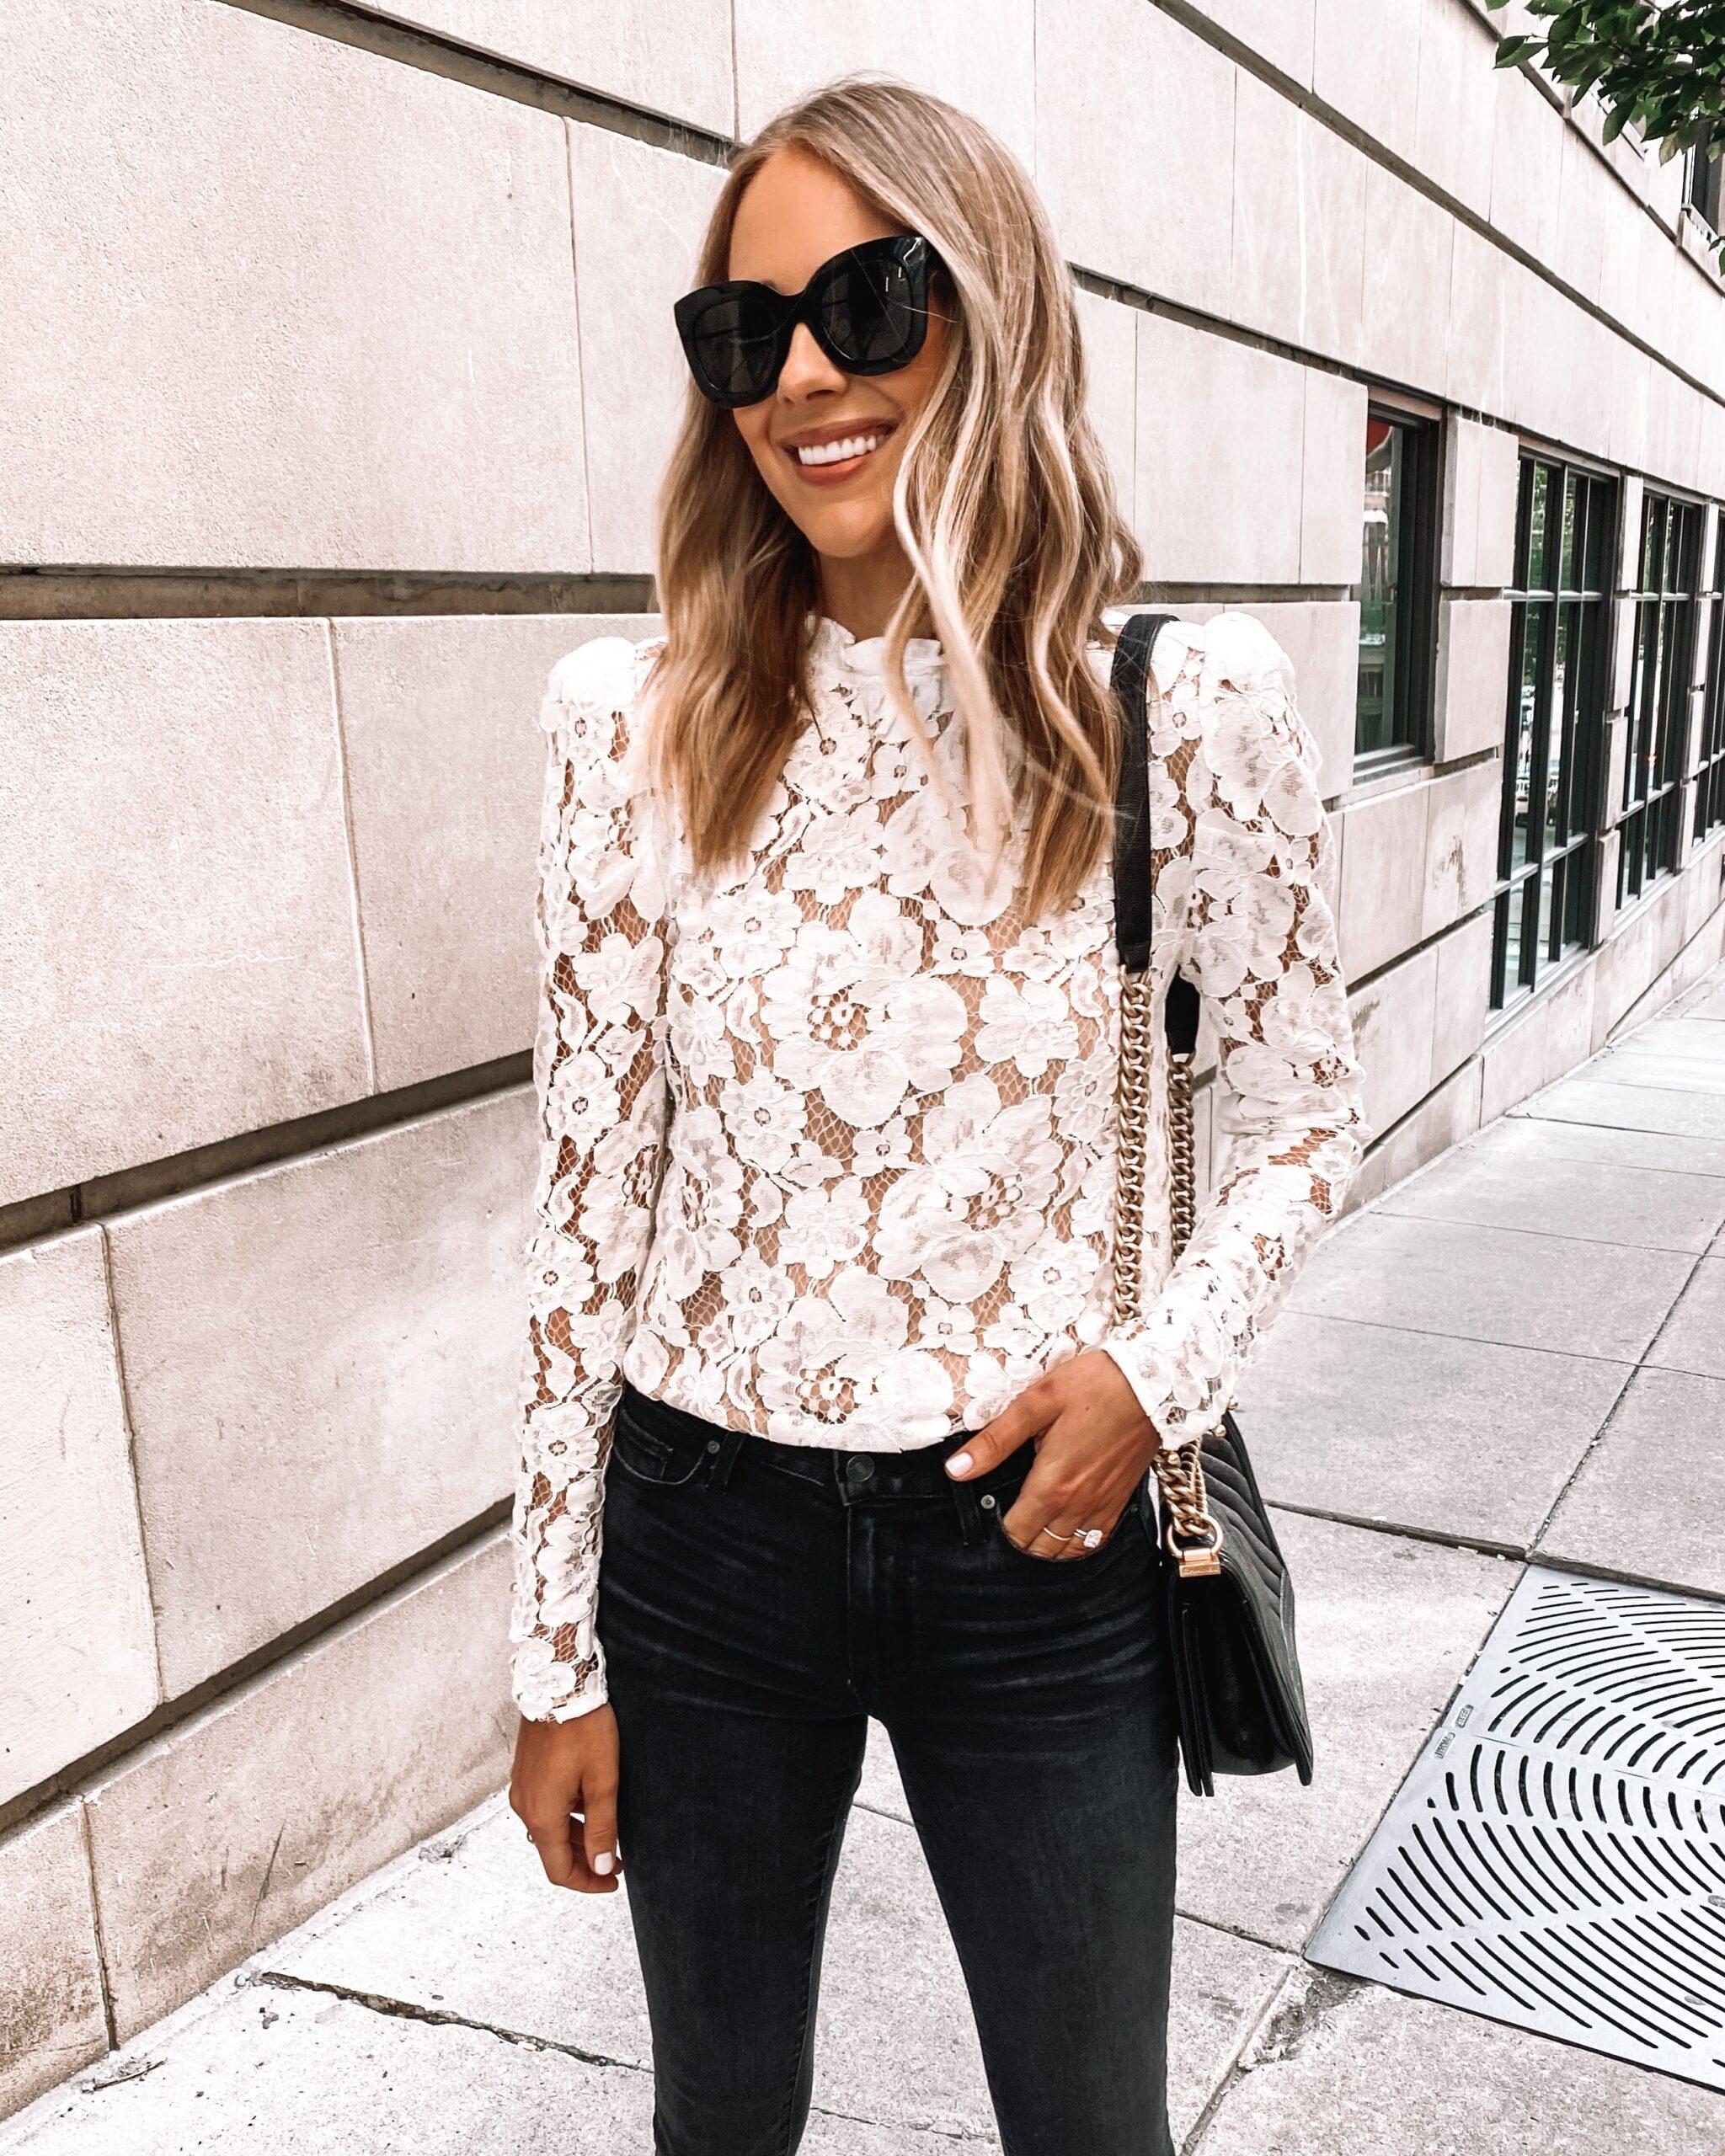 Fashion Jackson Wearing WAYF Emma White Lace Top Black Skinny Jeans